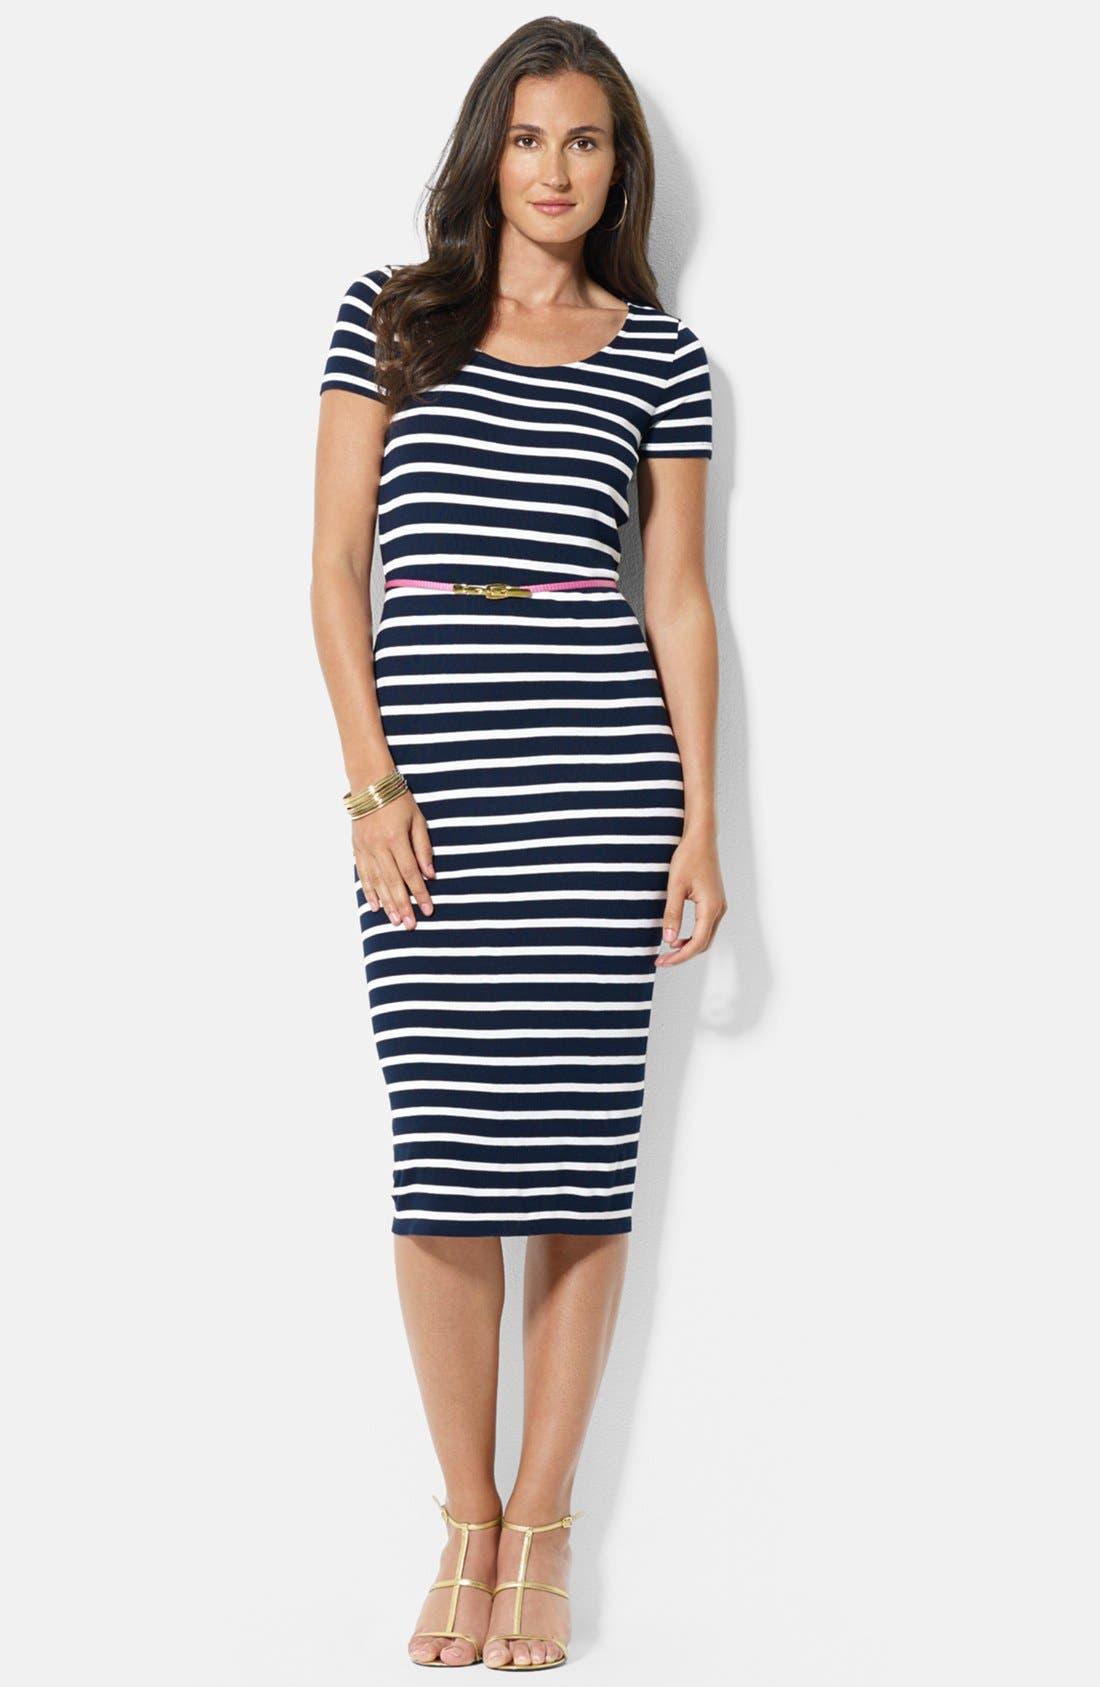 Alternate Image 1 Selected - Lauren Ralph Lauren Stripe Knit Dress (Petite)